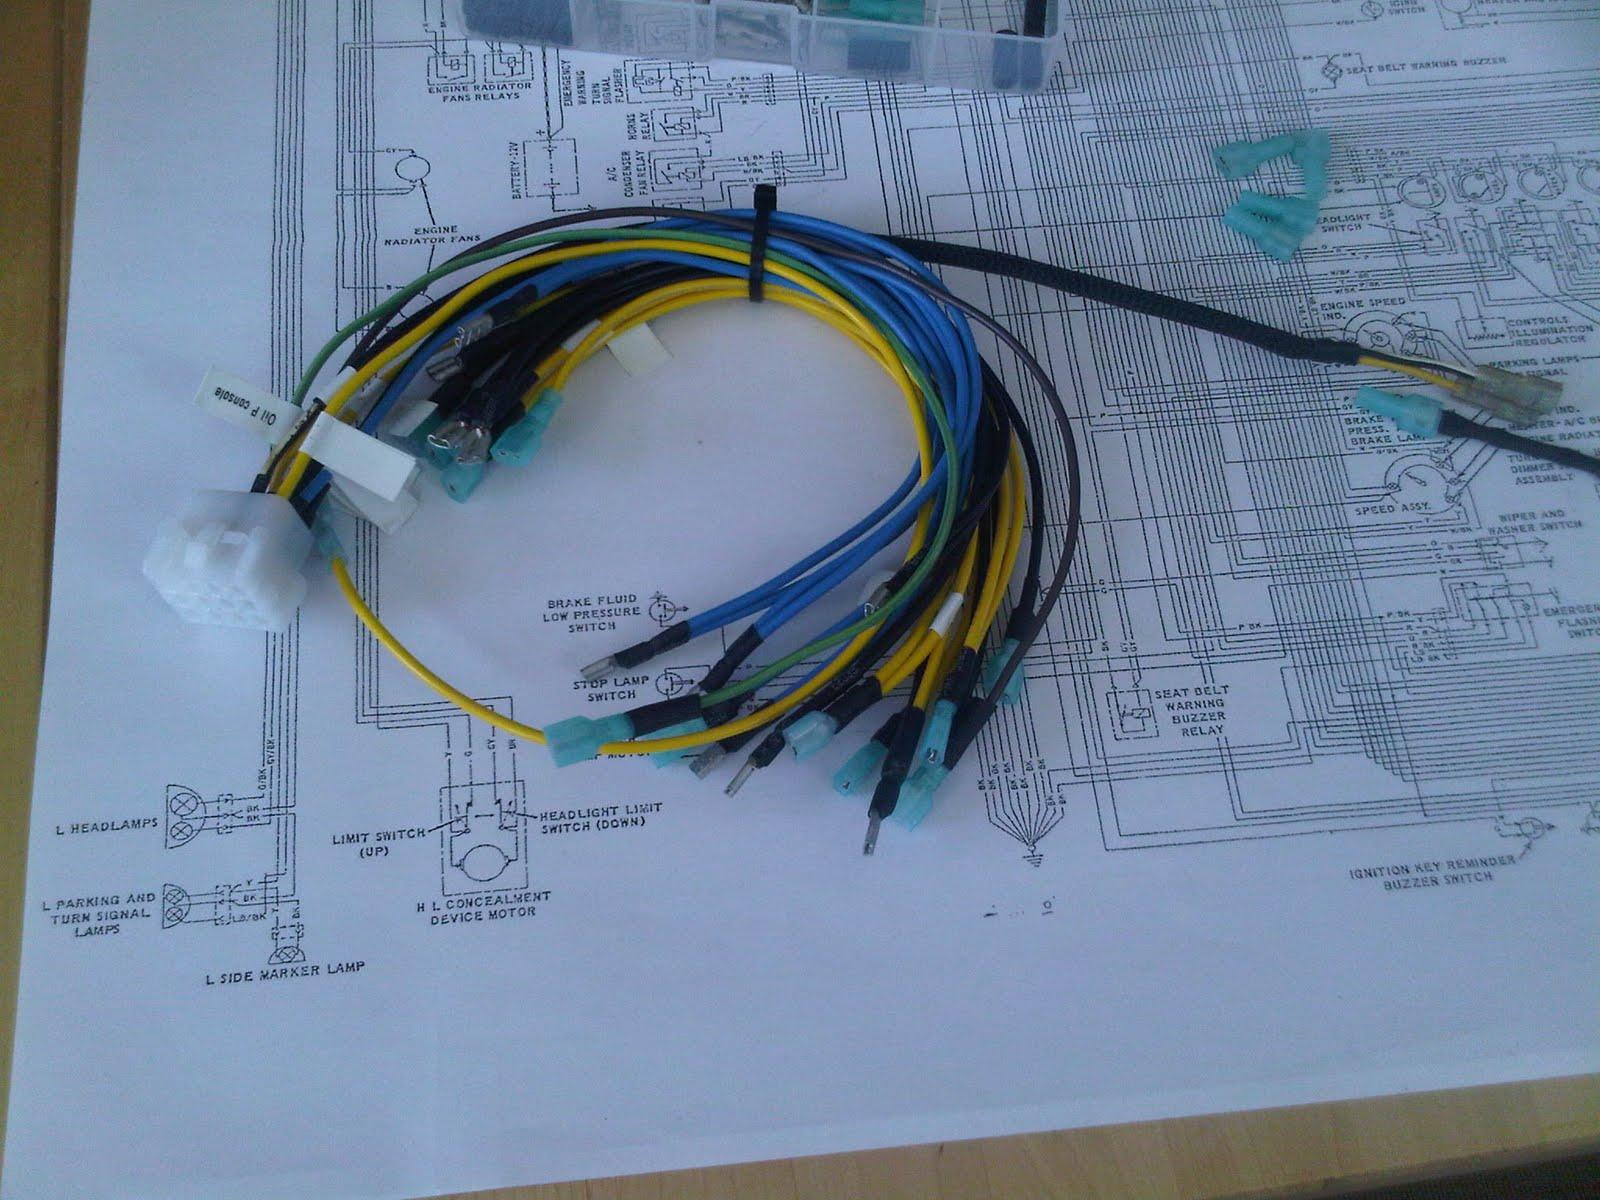 medium resolution of 1998 ski doo wiring diagram online